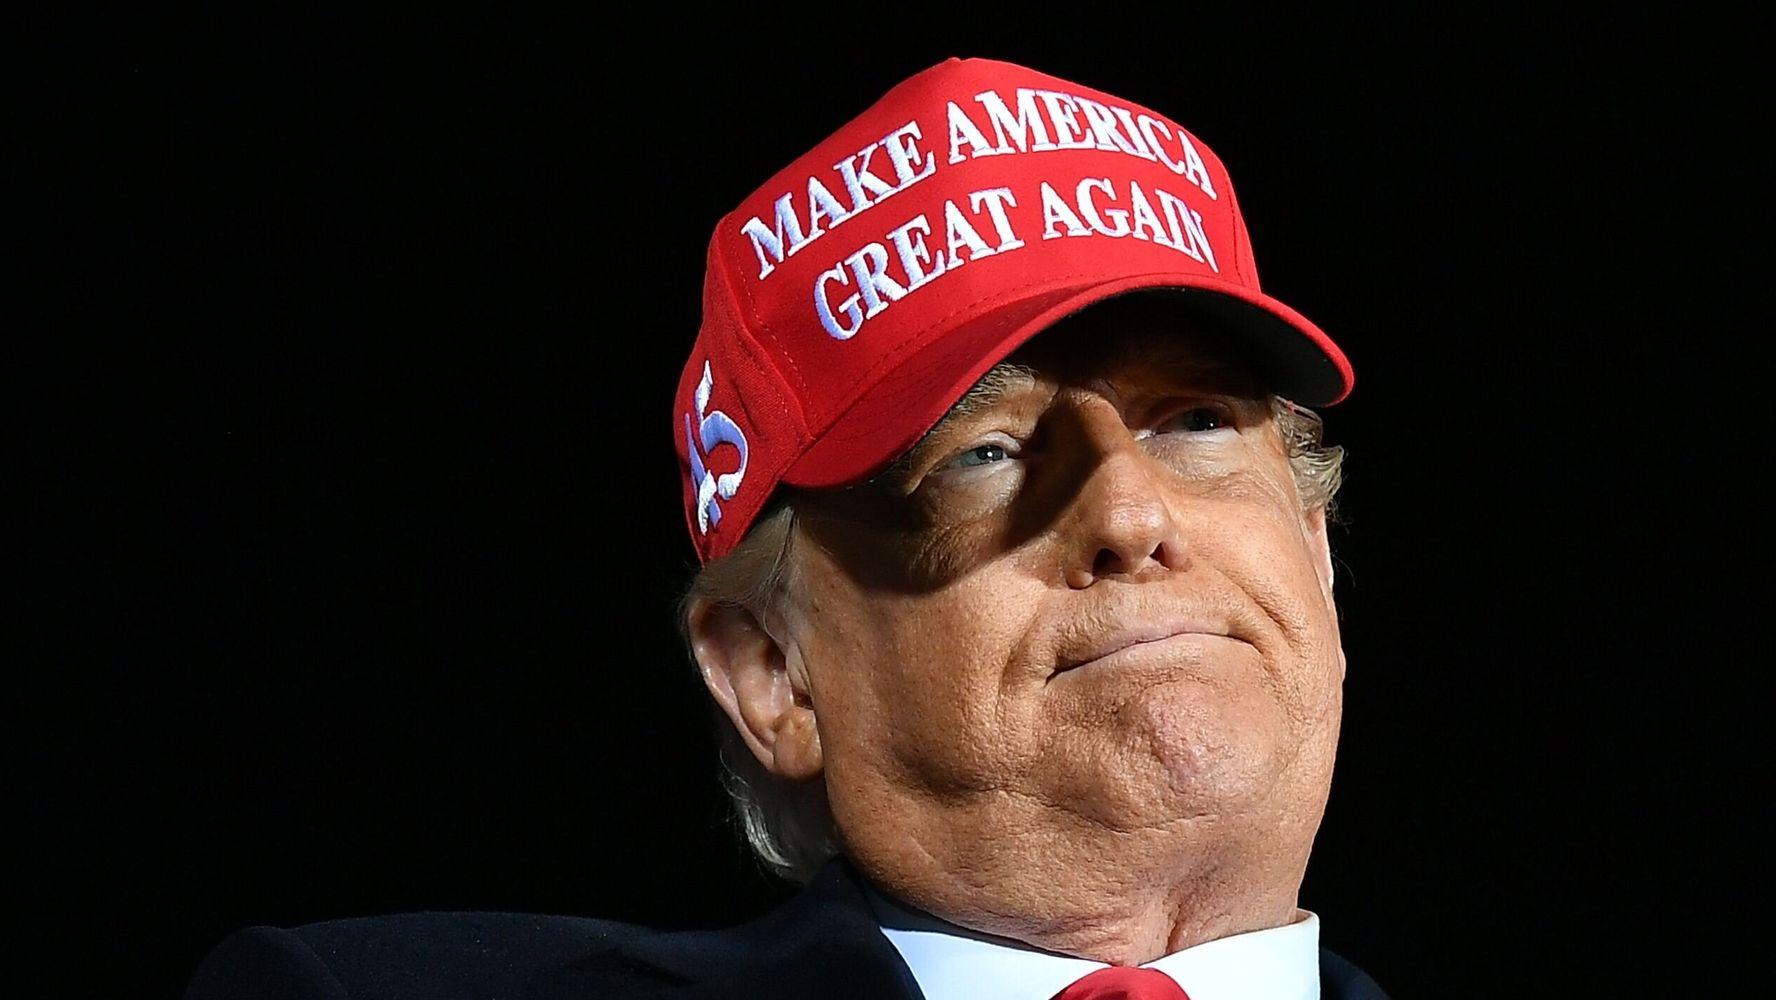 'Terrible And Unfair': Trump Already Bashes Next Debate Moderator, Kristen Welker